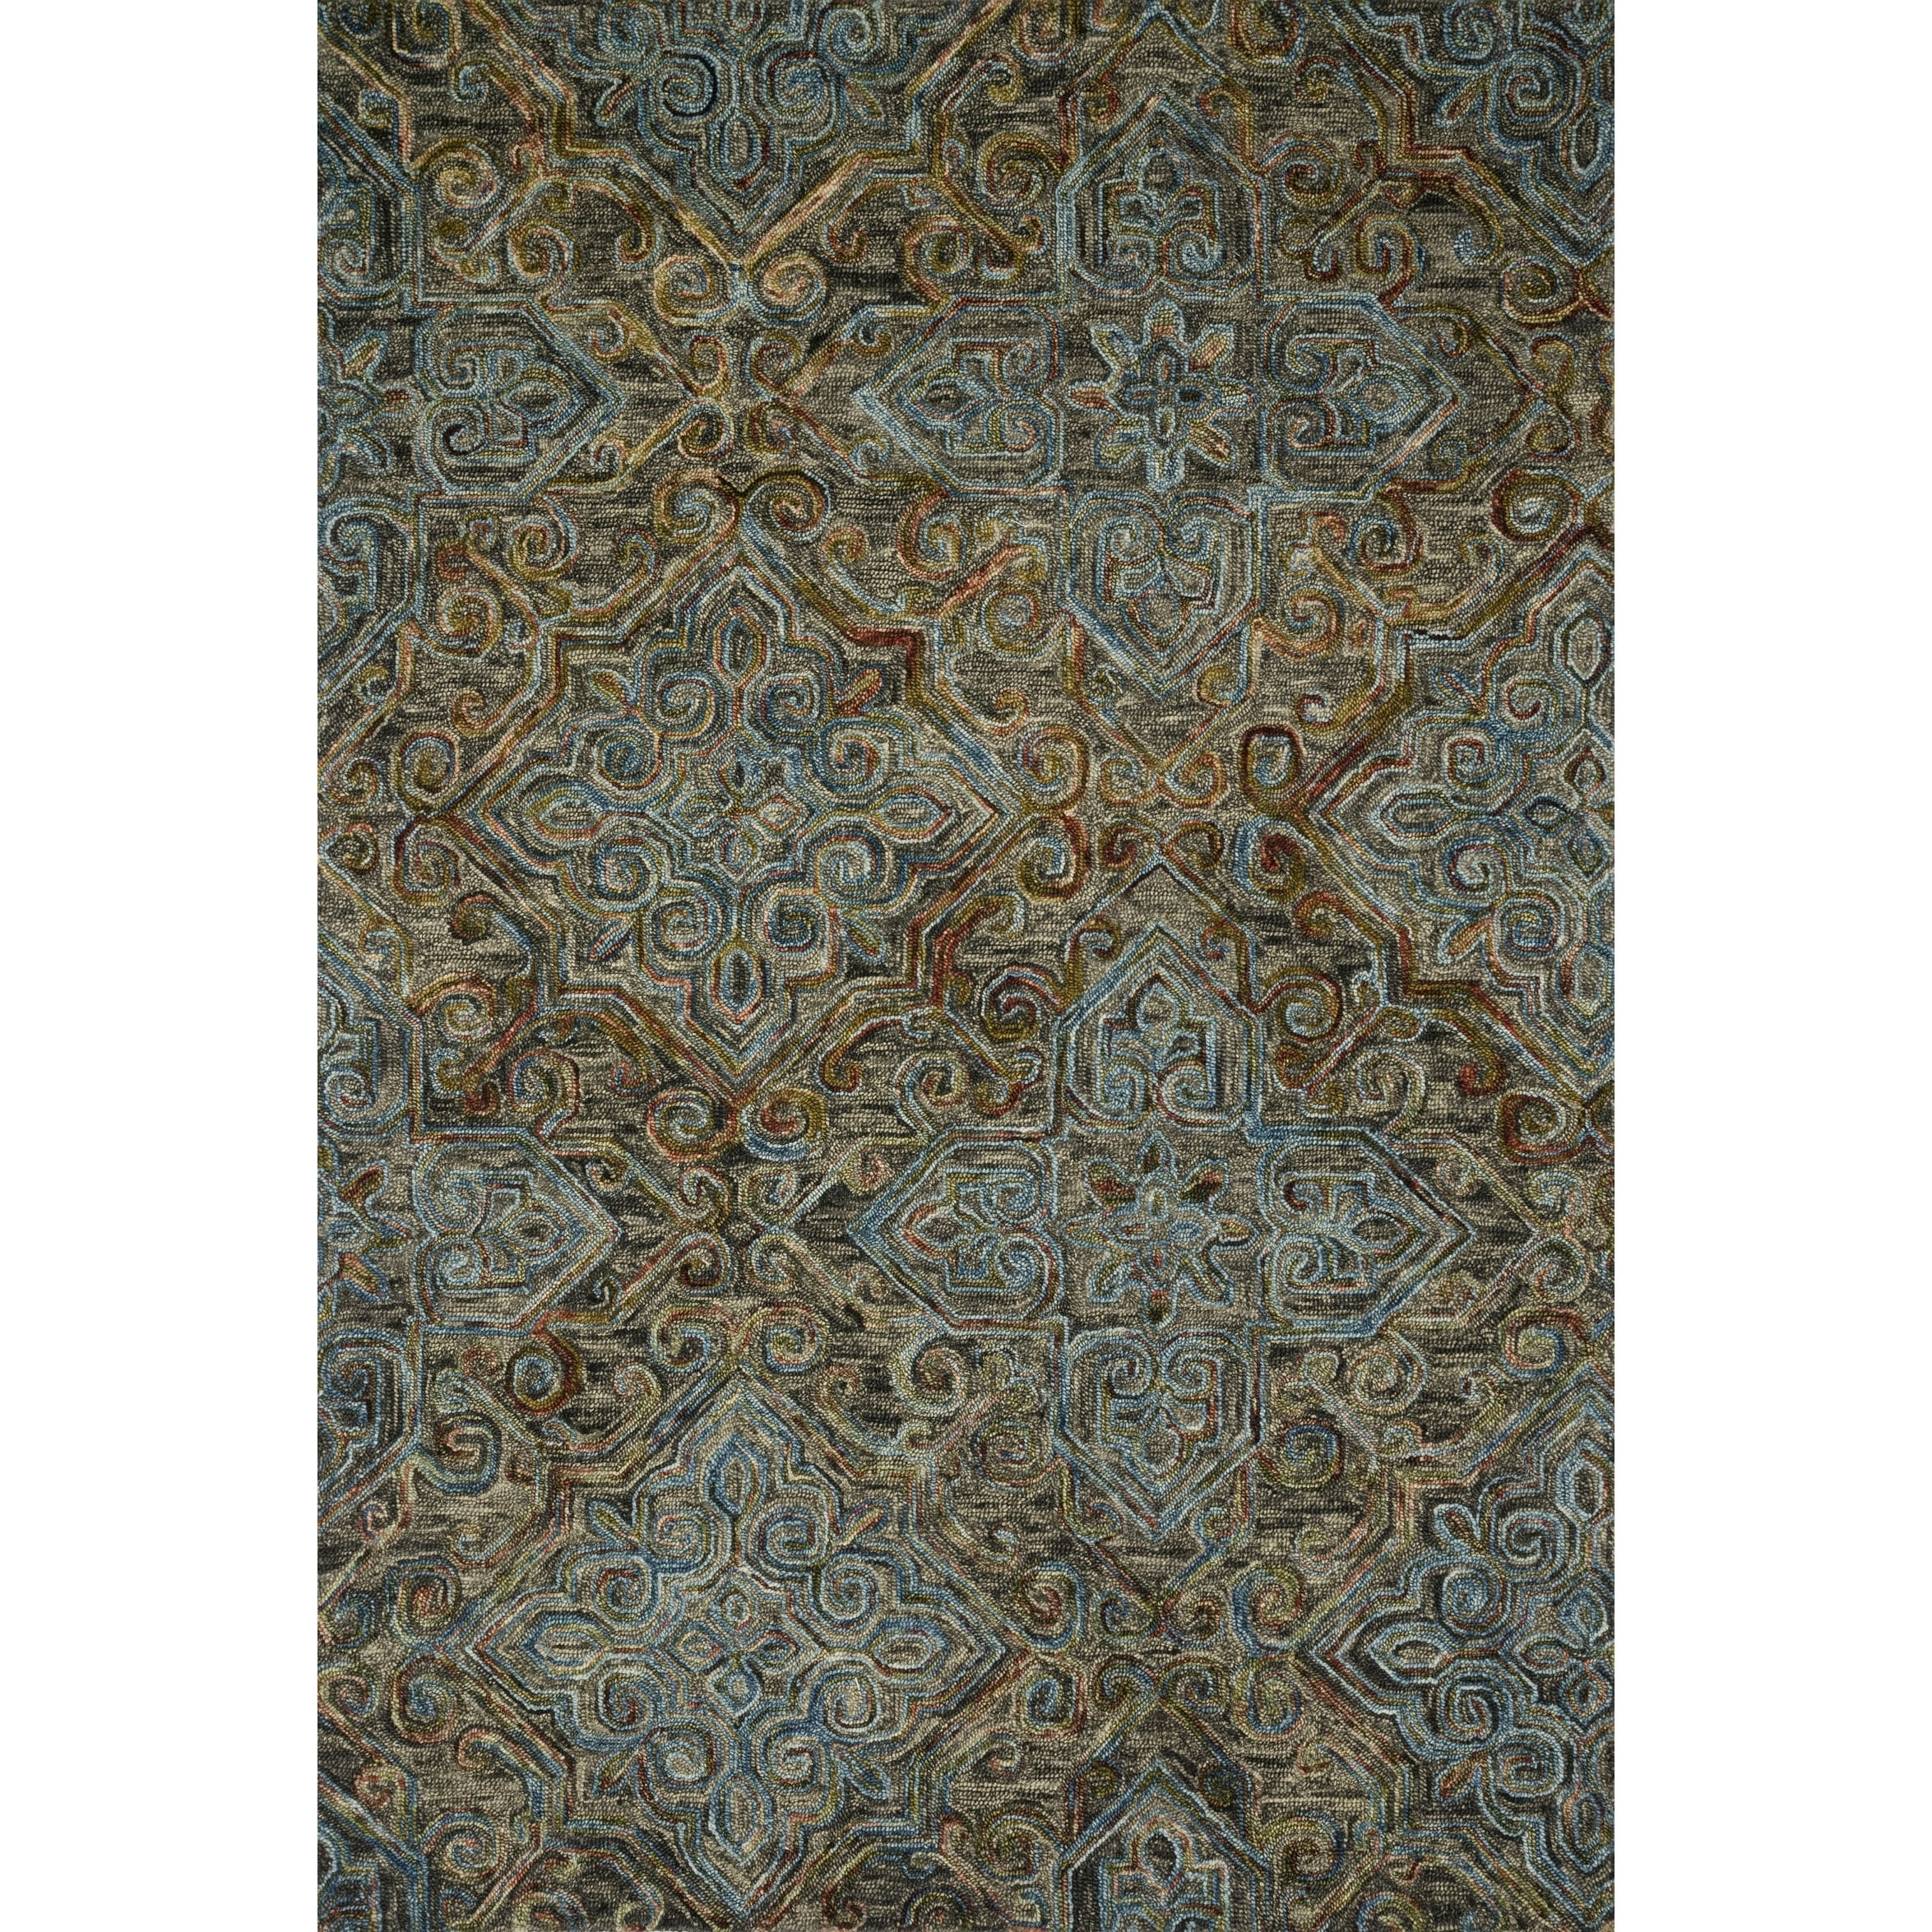 Hand Hooked Wool Dark Grey Multi Traditional Damask Area Rug 7